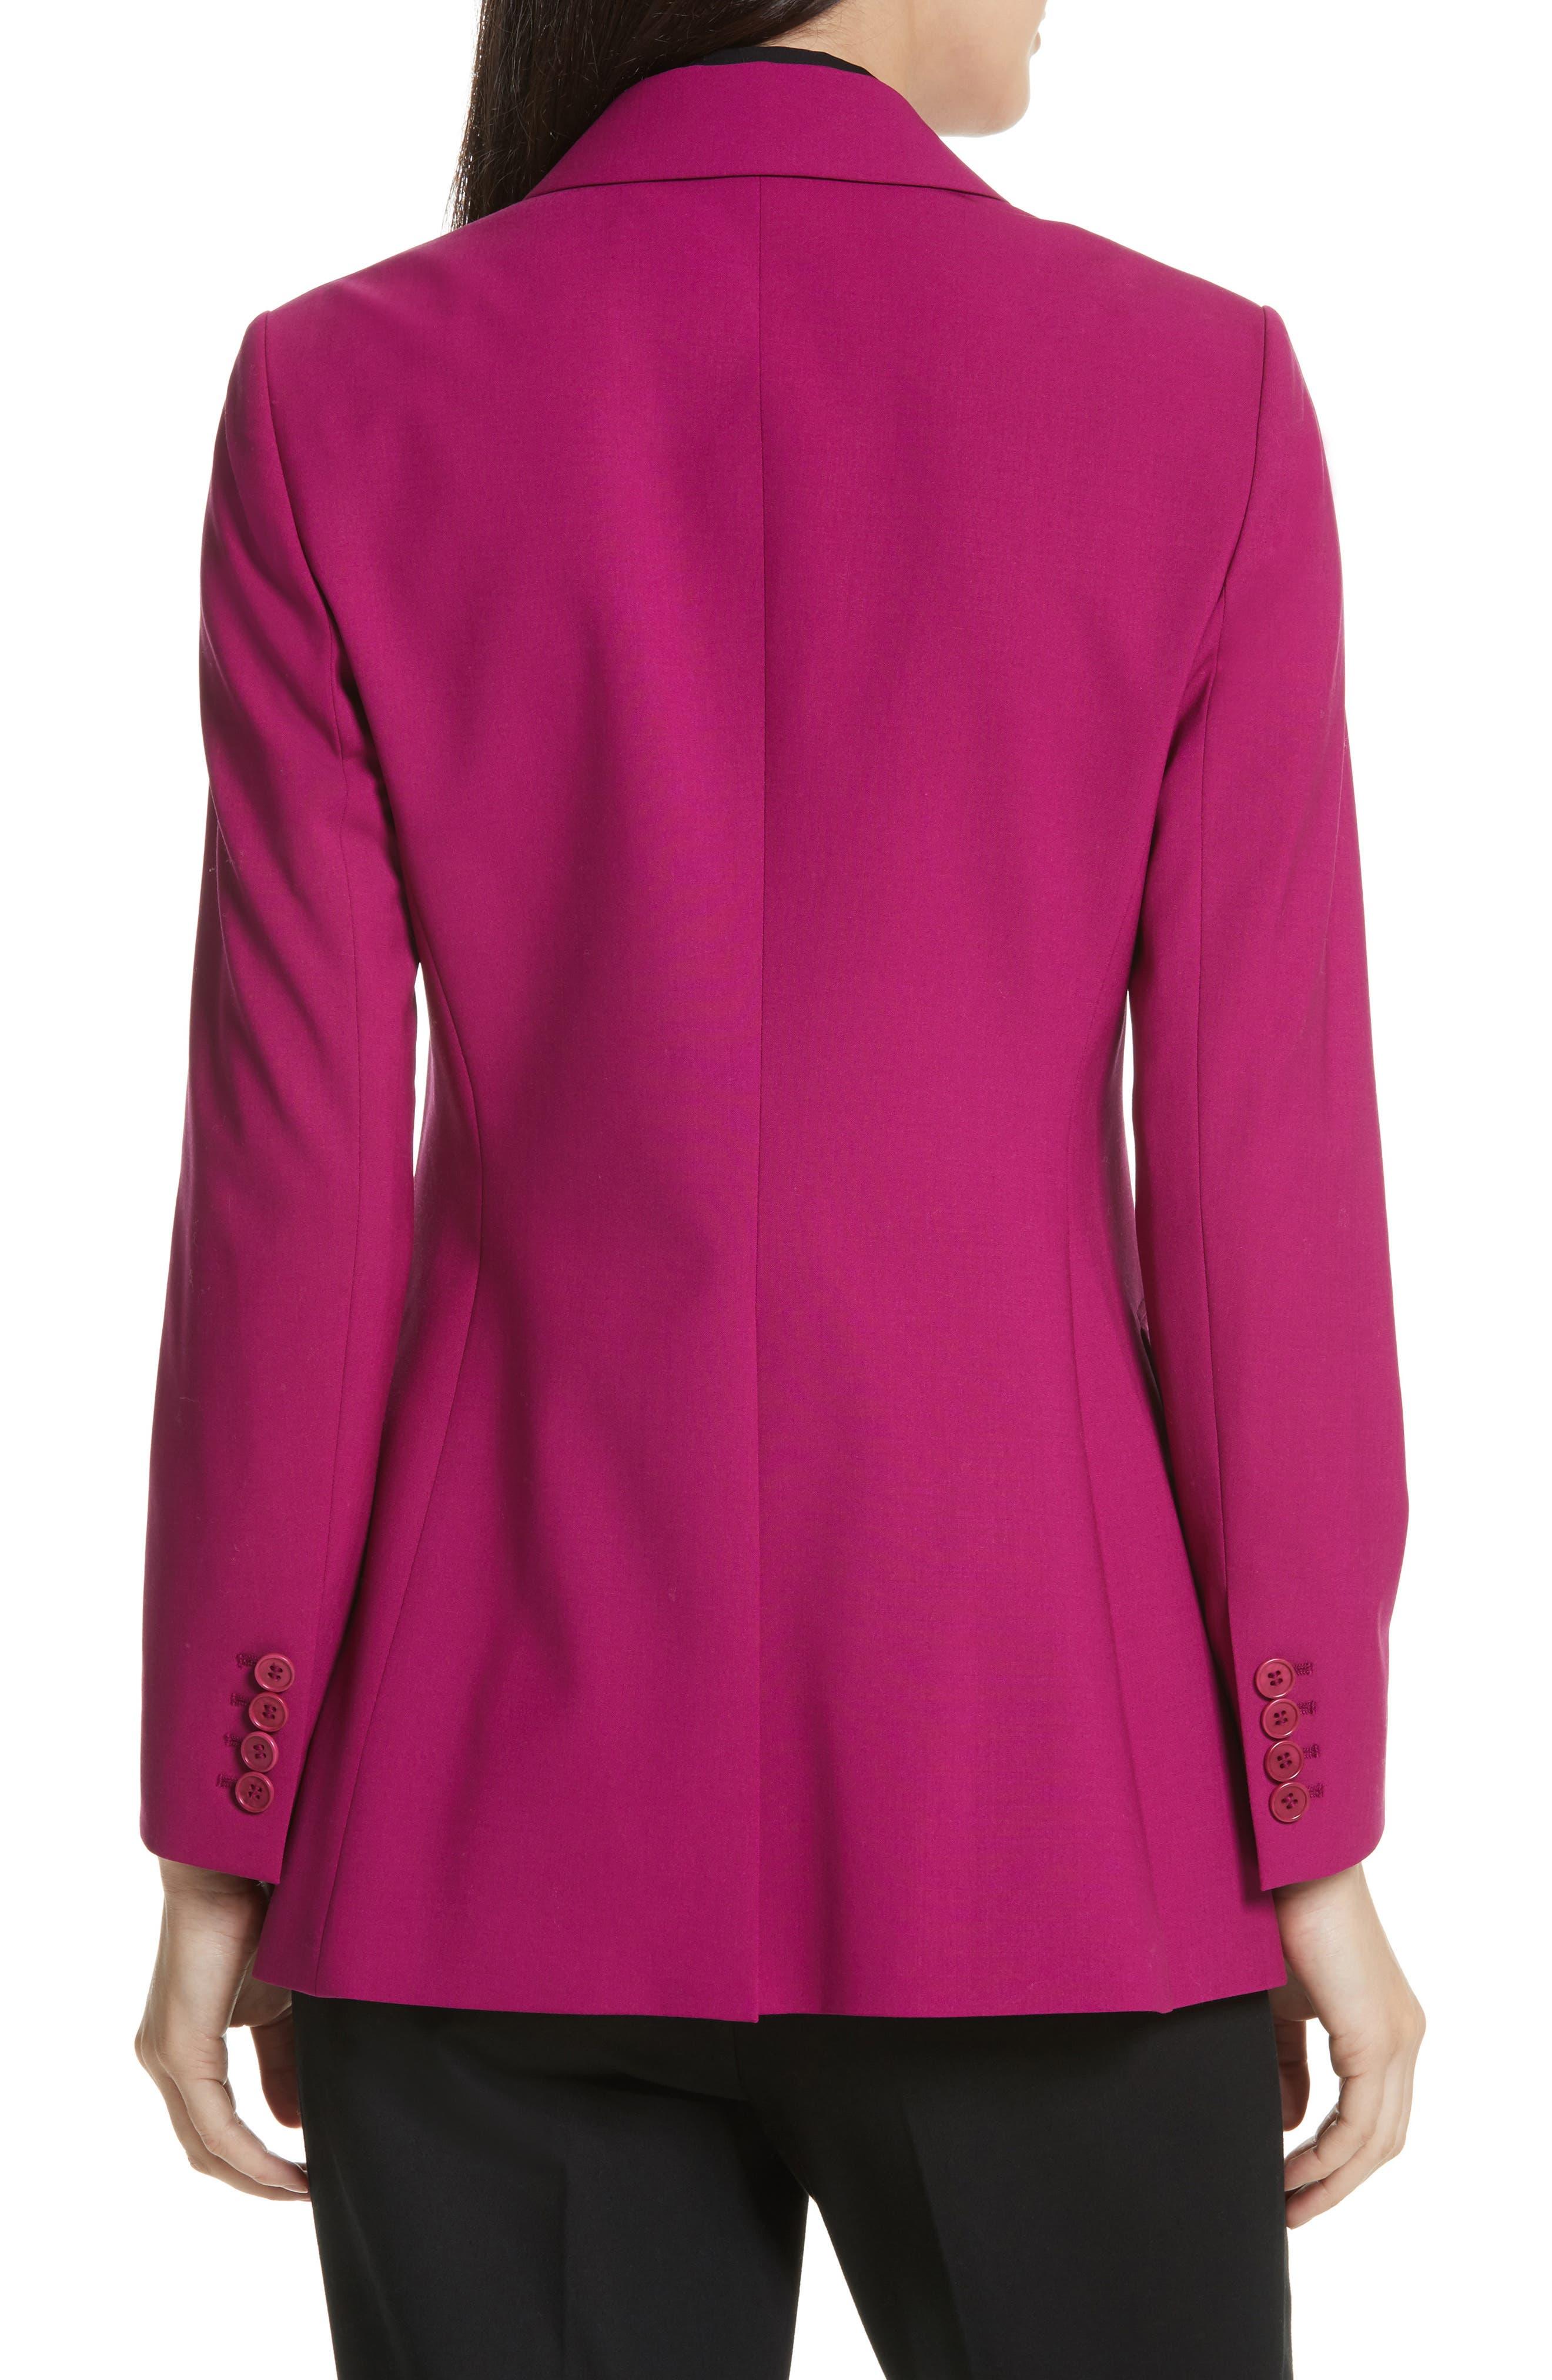 Etienette B Good Wool Suit Jacket,                             Alternate thumbnail 14, color,